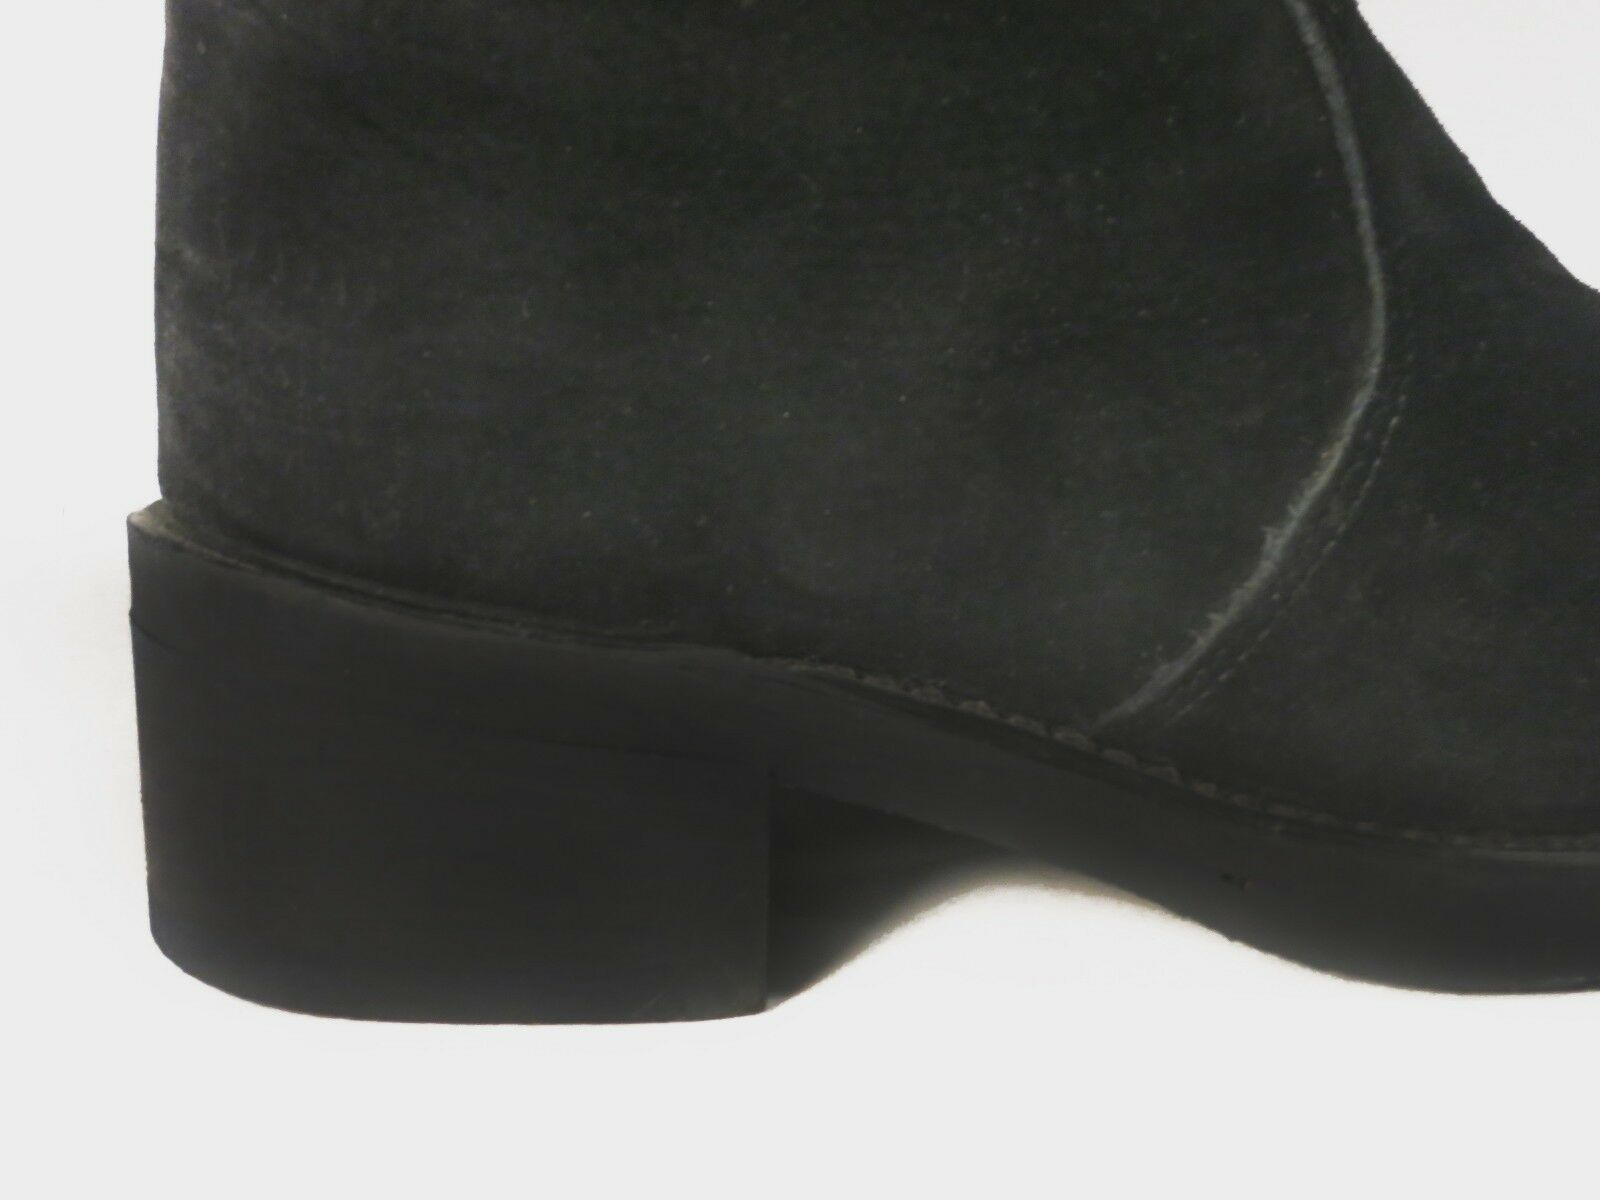 DURANGO STIEFEL STIEFEL STIEFEL SENDRA COWBOY PISTOL ANKLE BIKER Stiefel WESTERN BLOCK USEX HEEL 7 c24362